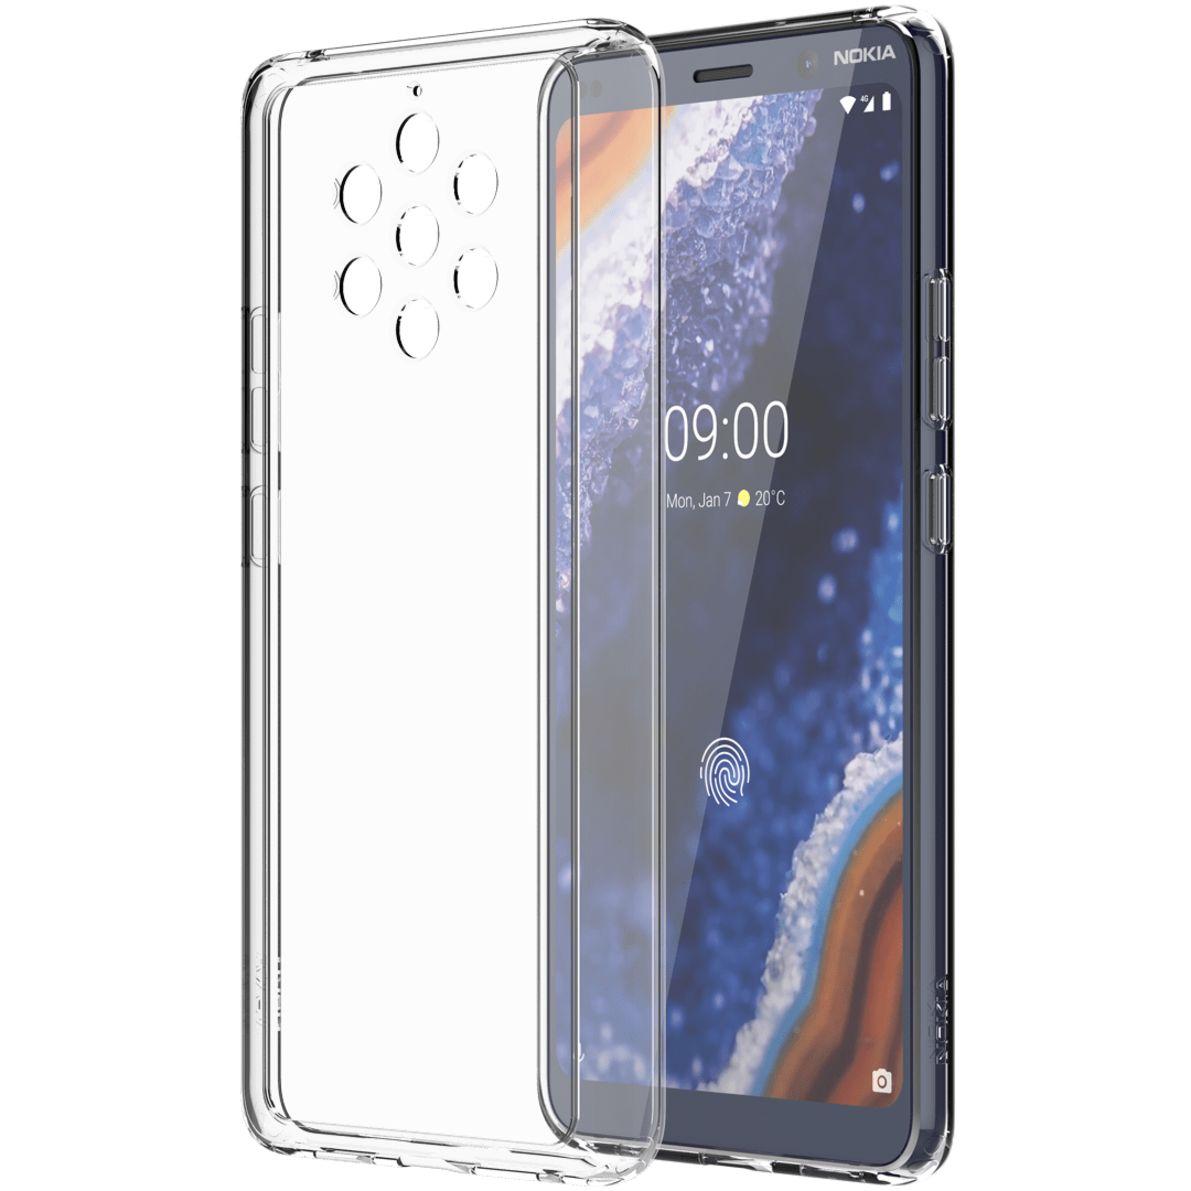 size 40 b8ea8 47488 Nokia Premium Clear phone case | Nokia phones